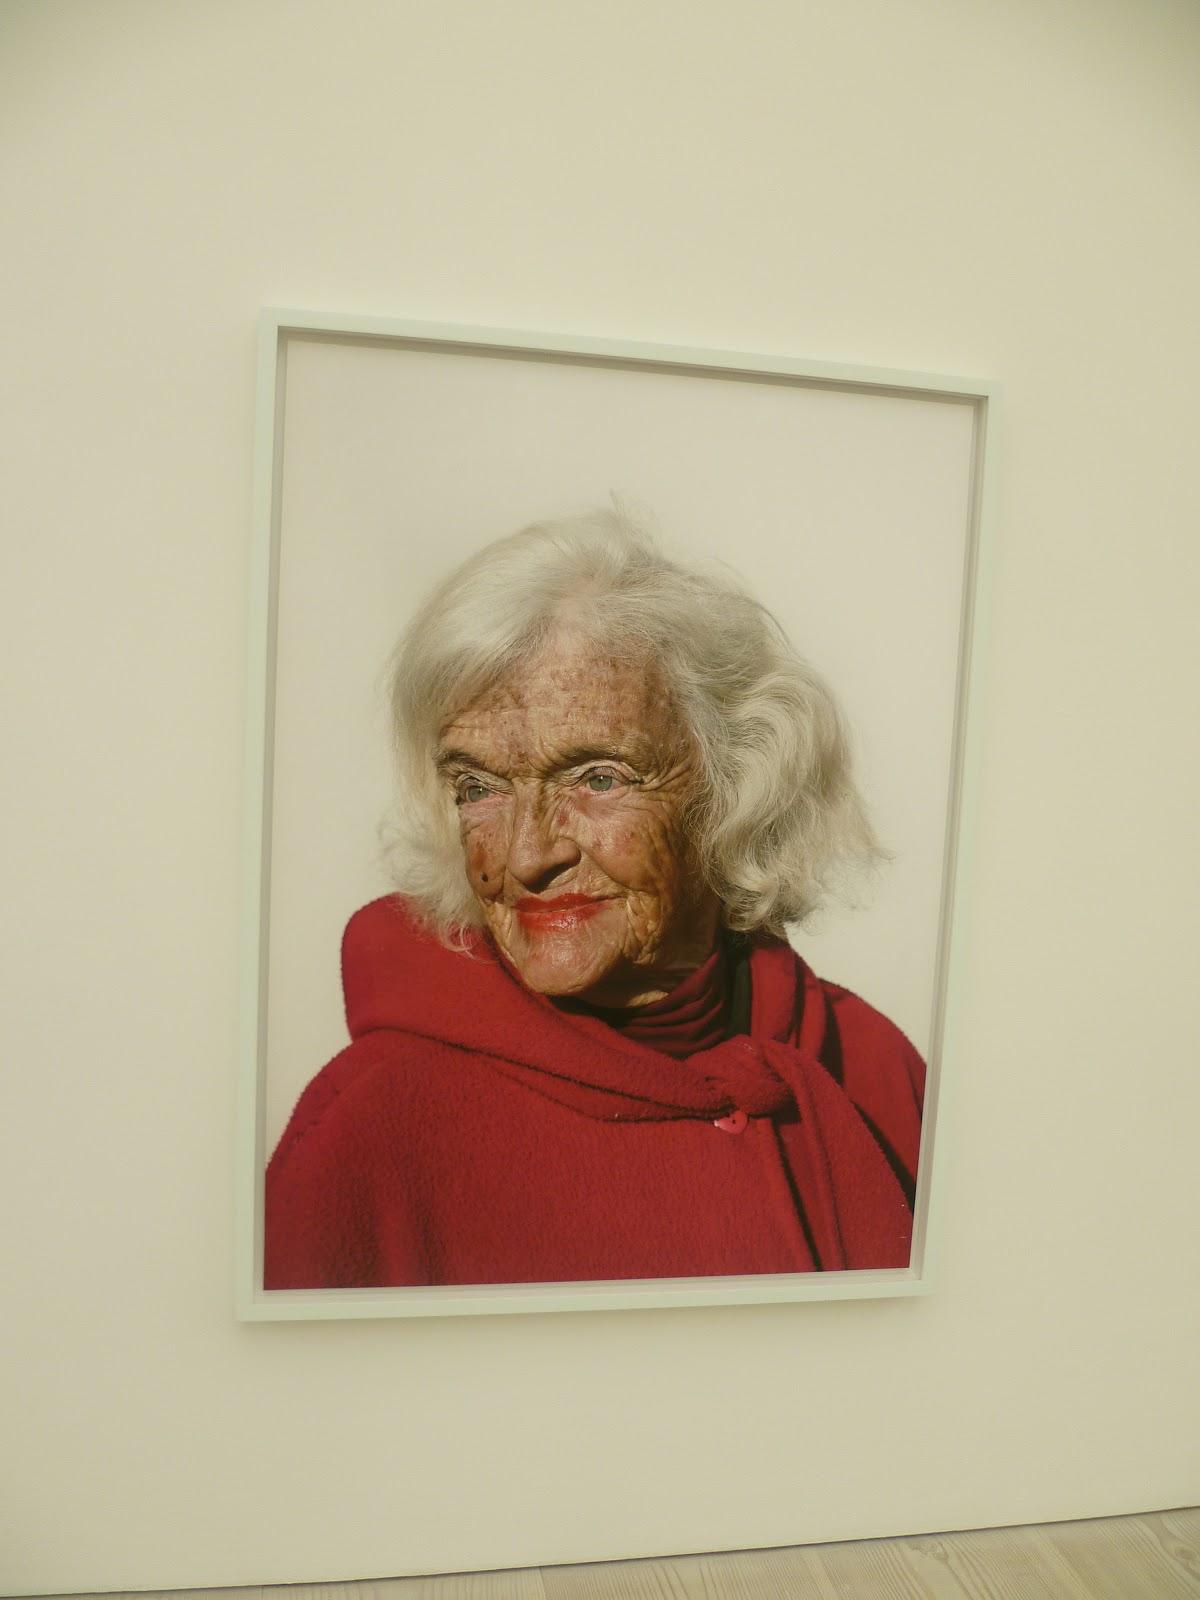 Walk to Free Art London: 194. ANONYMOUS by KATY GRANNAN